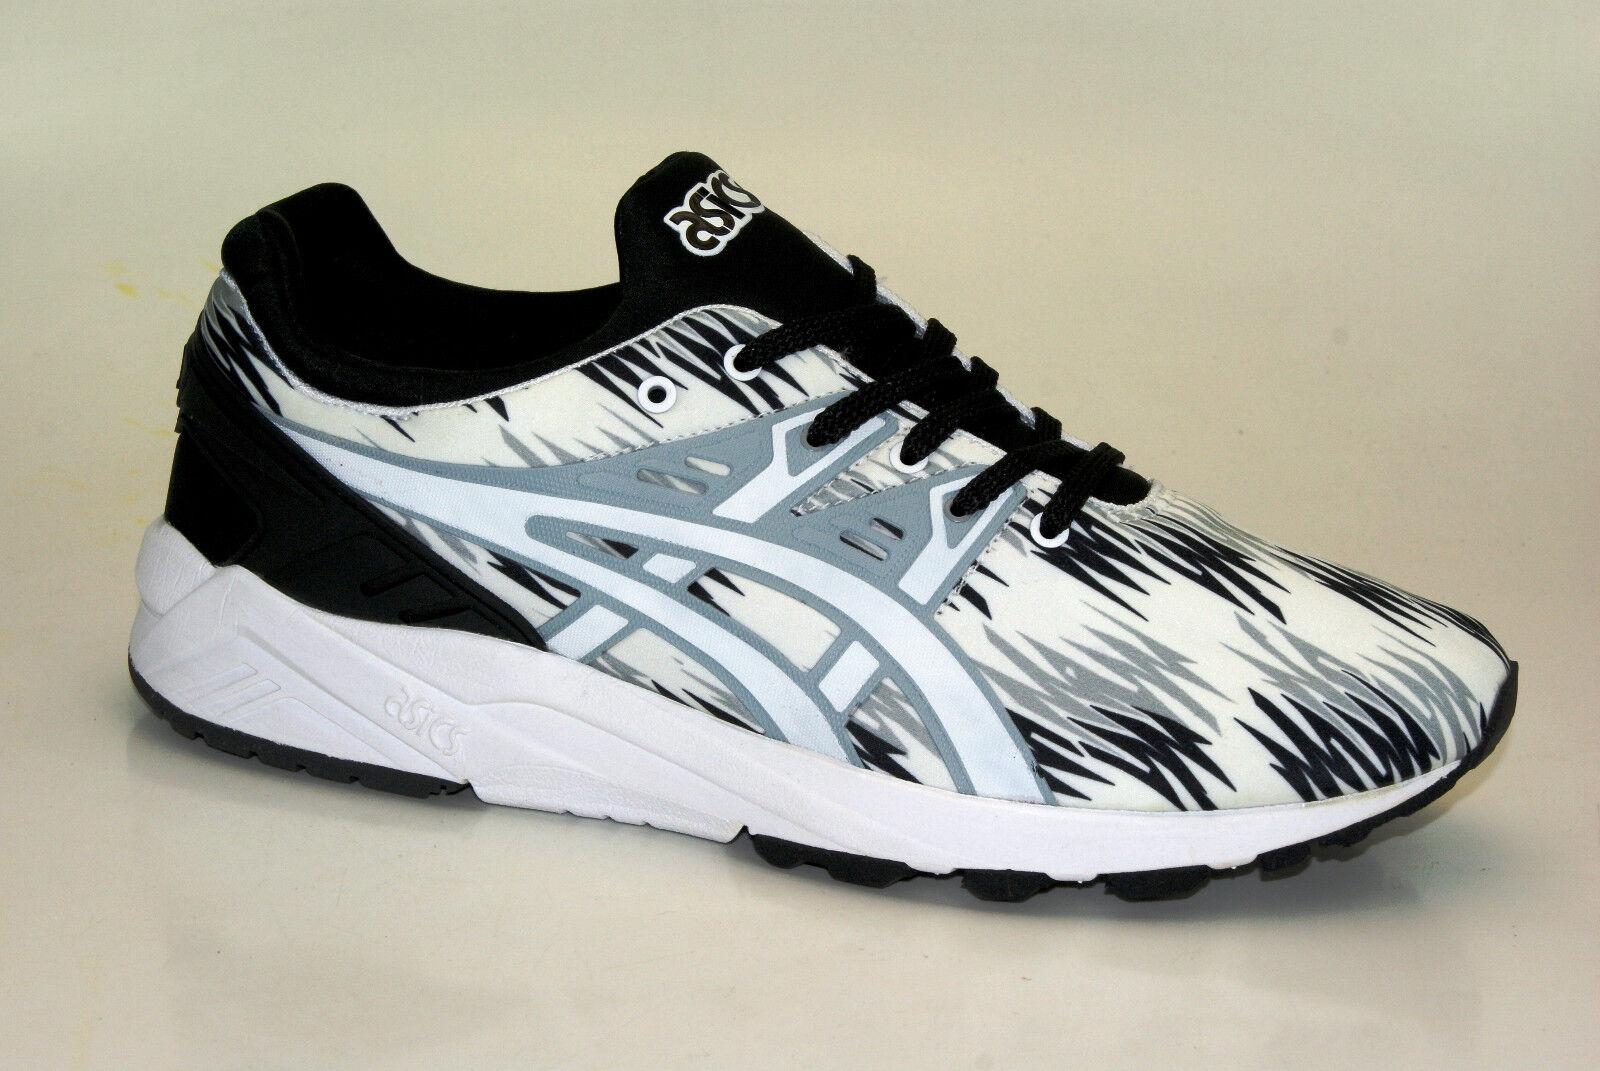 Asics Gel-Kayano Trainer Evo Sneakers Turnschuhe Laufschuhe Herren H6C3N-9001